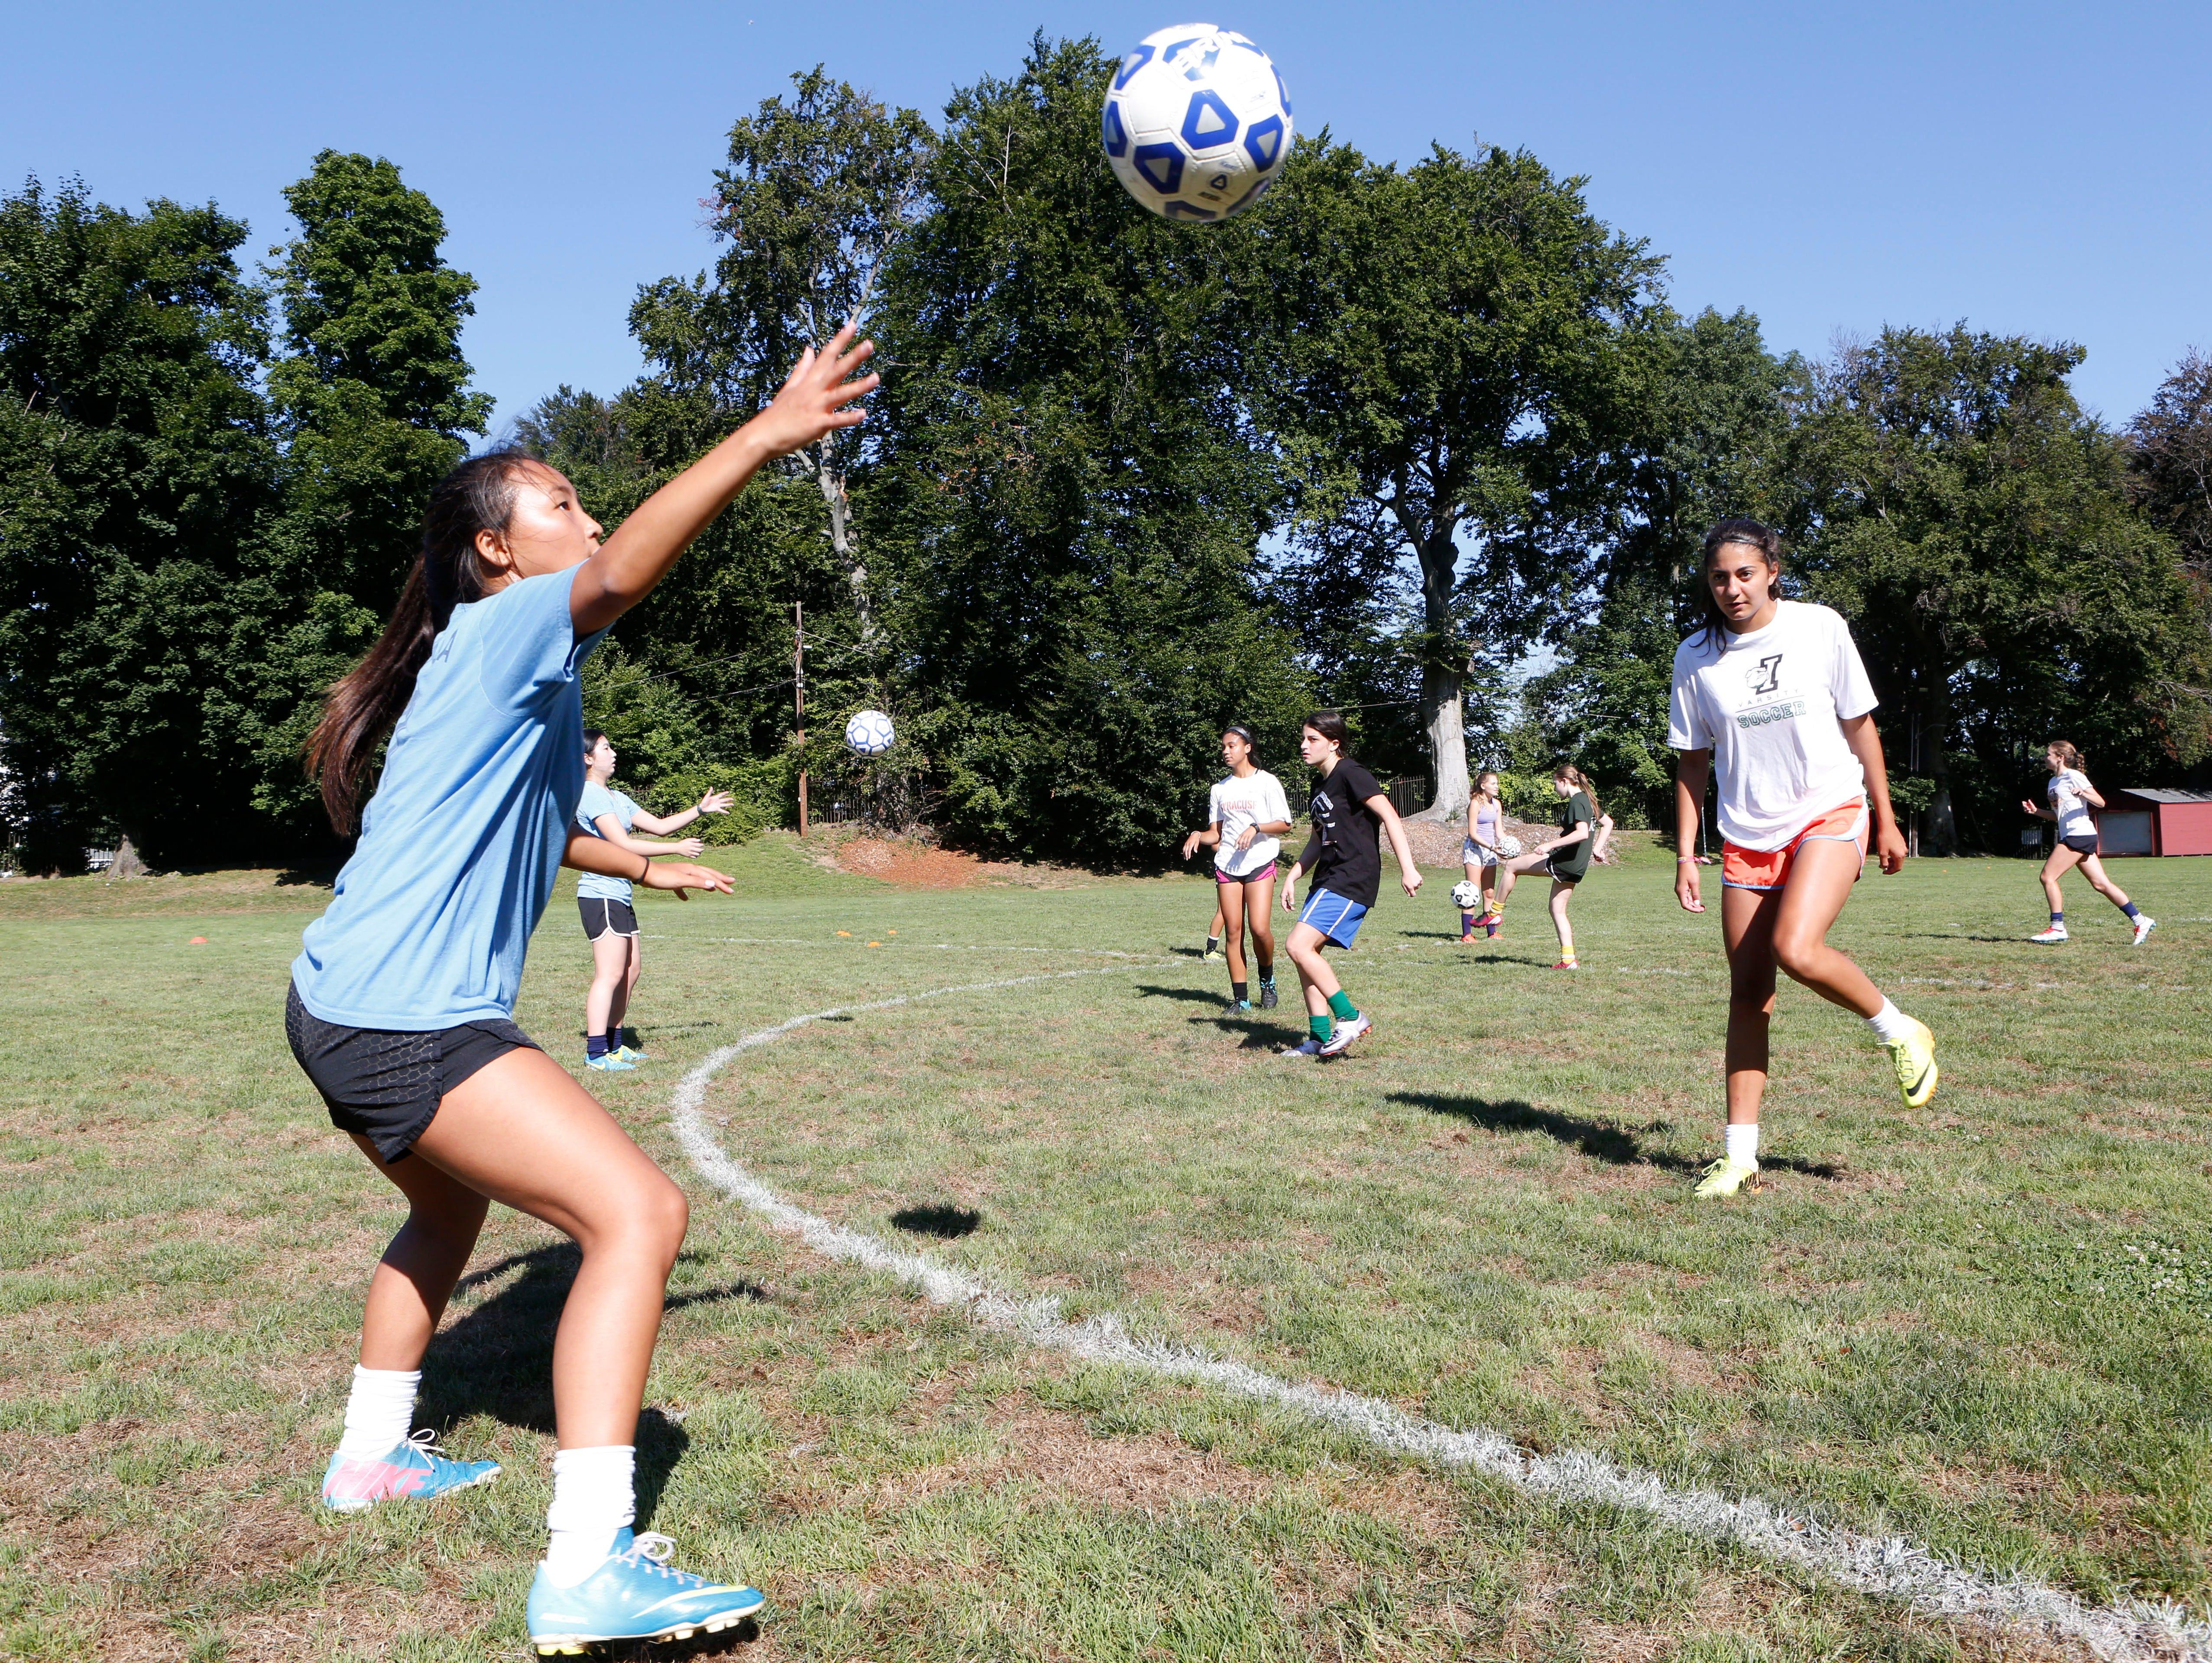 Juniors Okna Freeman, left, and Olivia Valdes run through drills during soccer practice Aug. 24, 2016 at Memorial Field in Irvington.